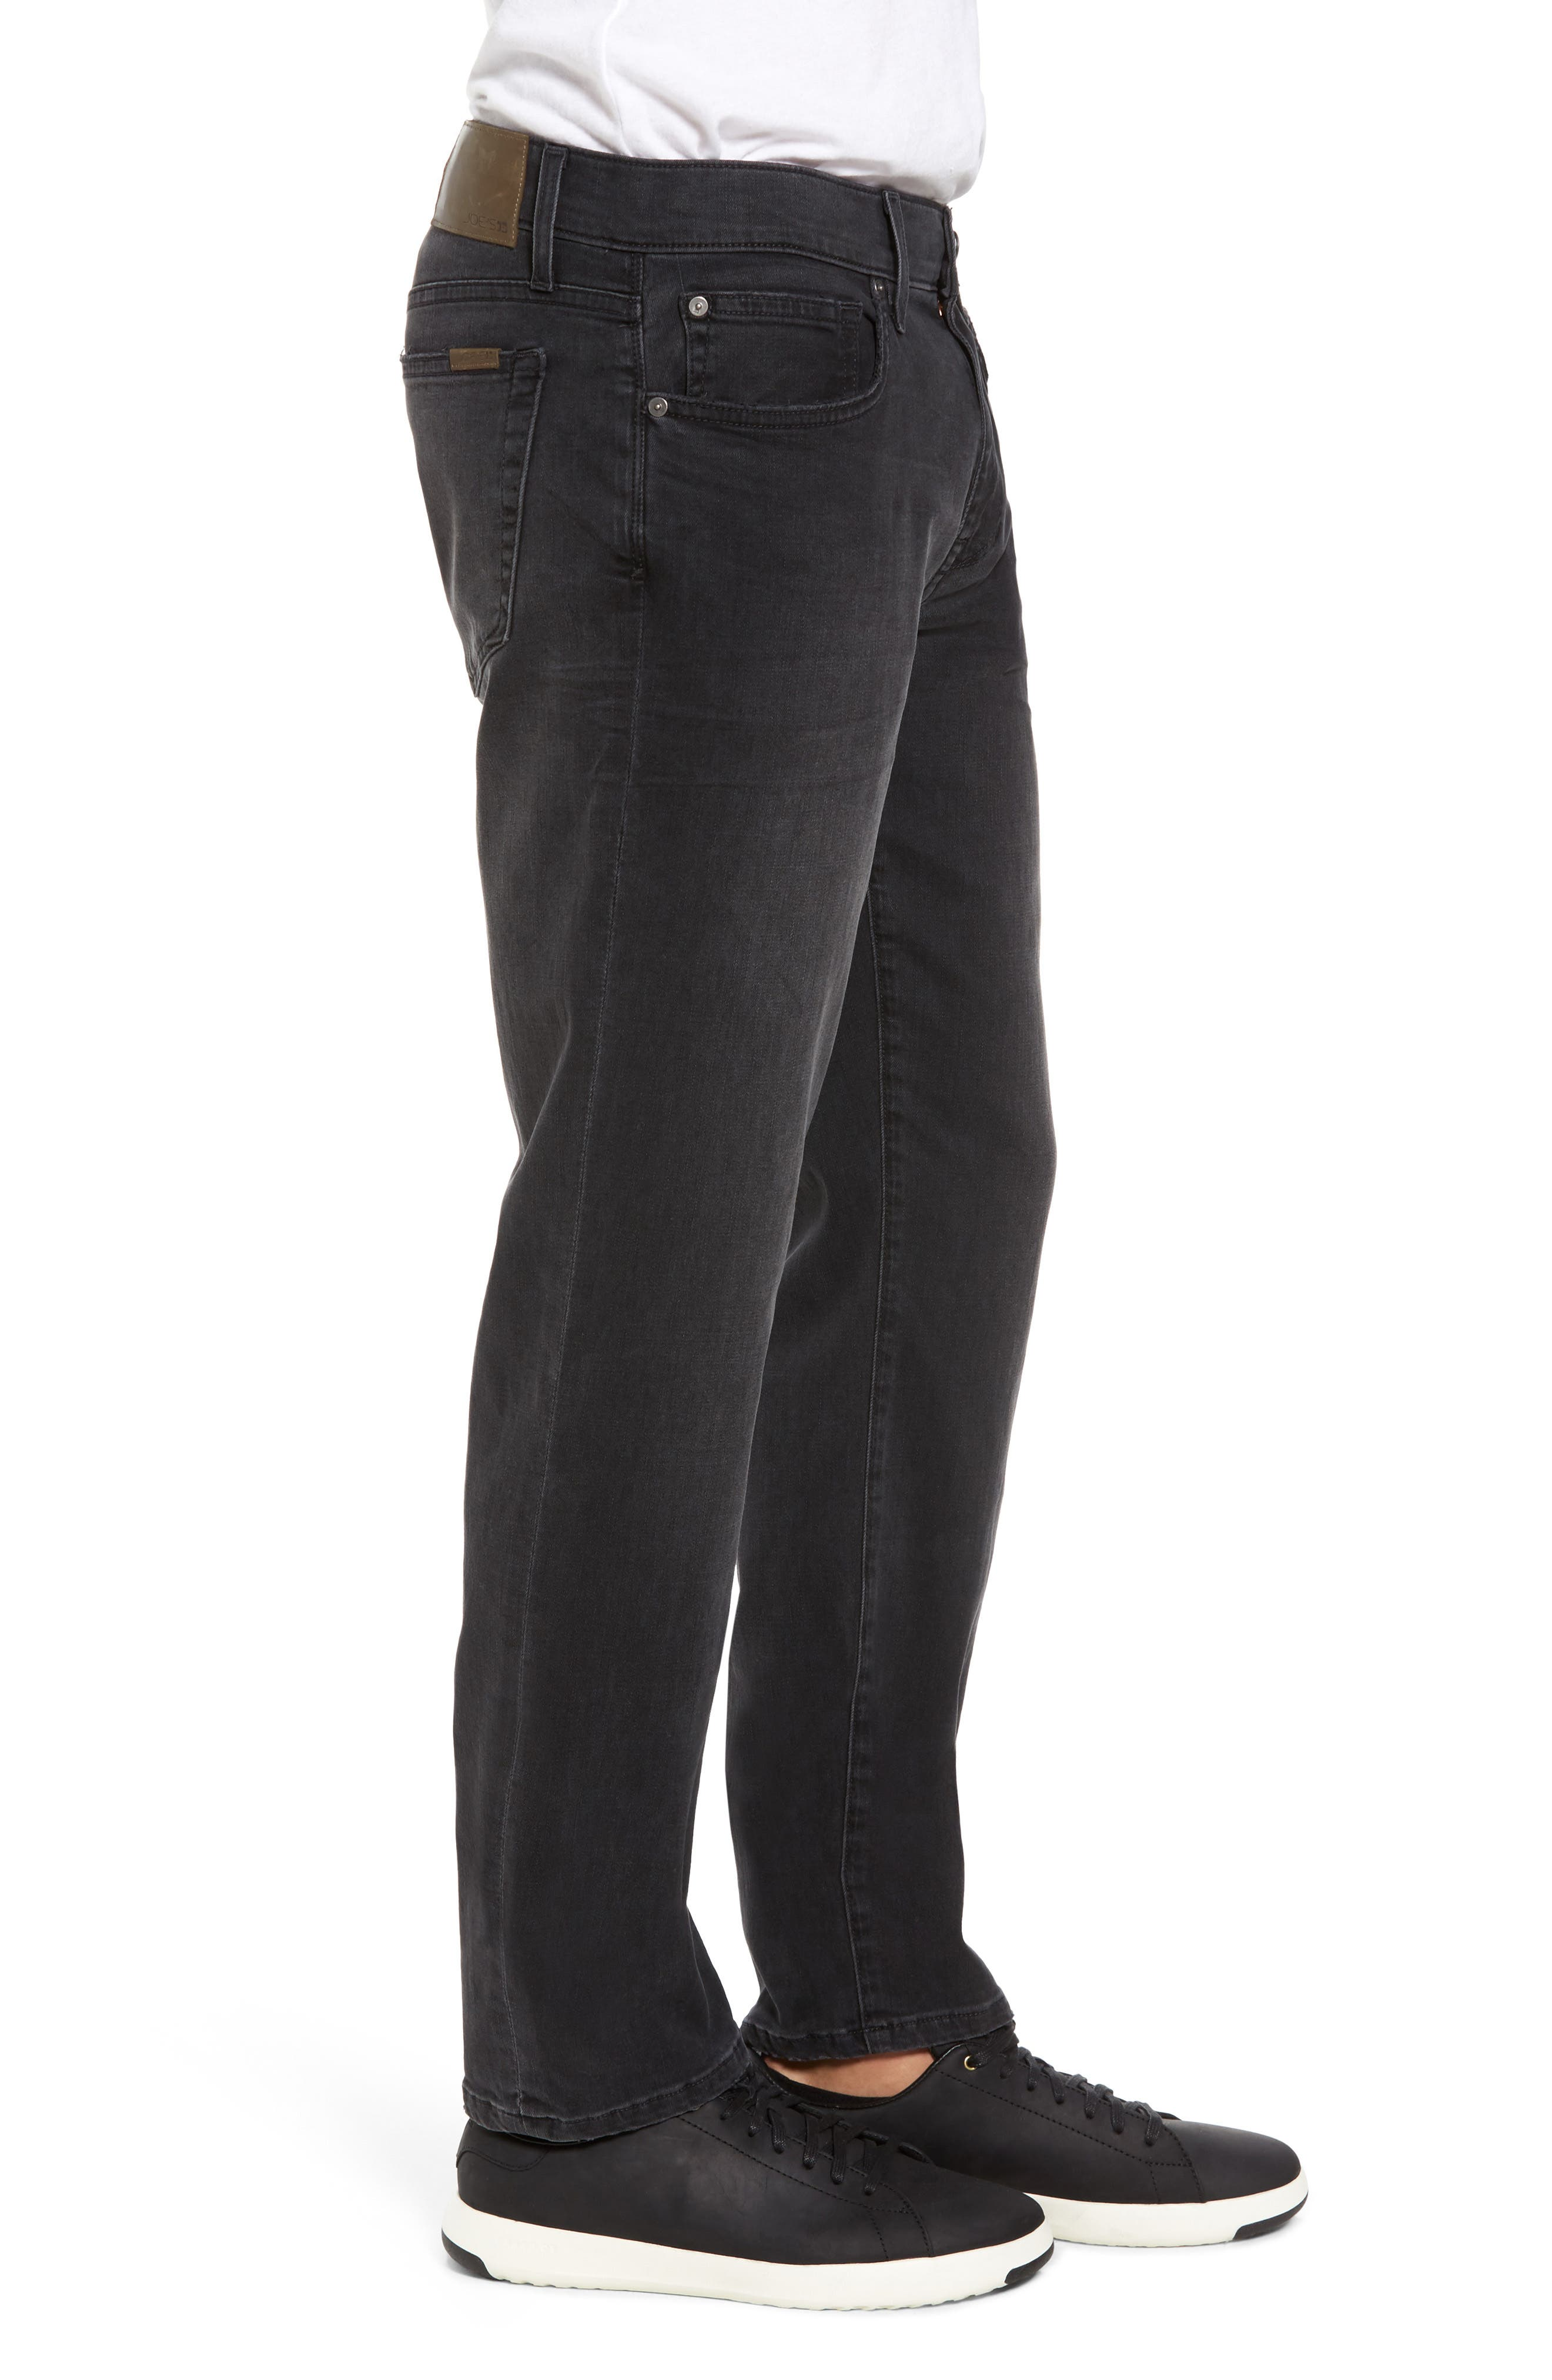 Brixton Slim Straight Fit Jeans,                             Alternate thumbnail 3, color,                             015